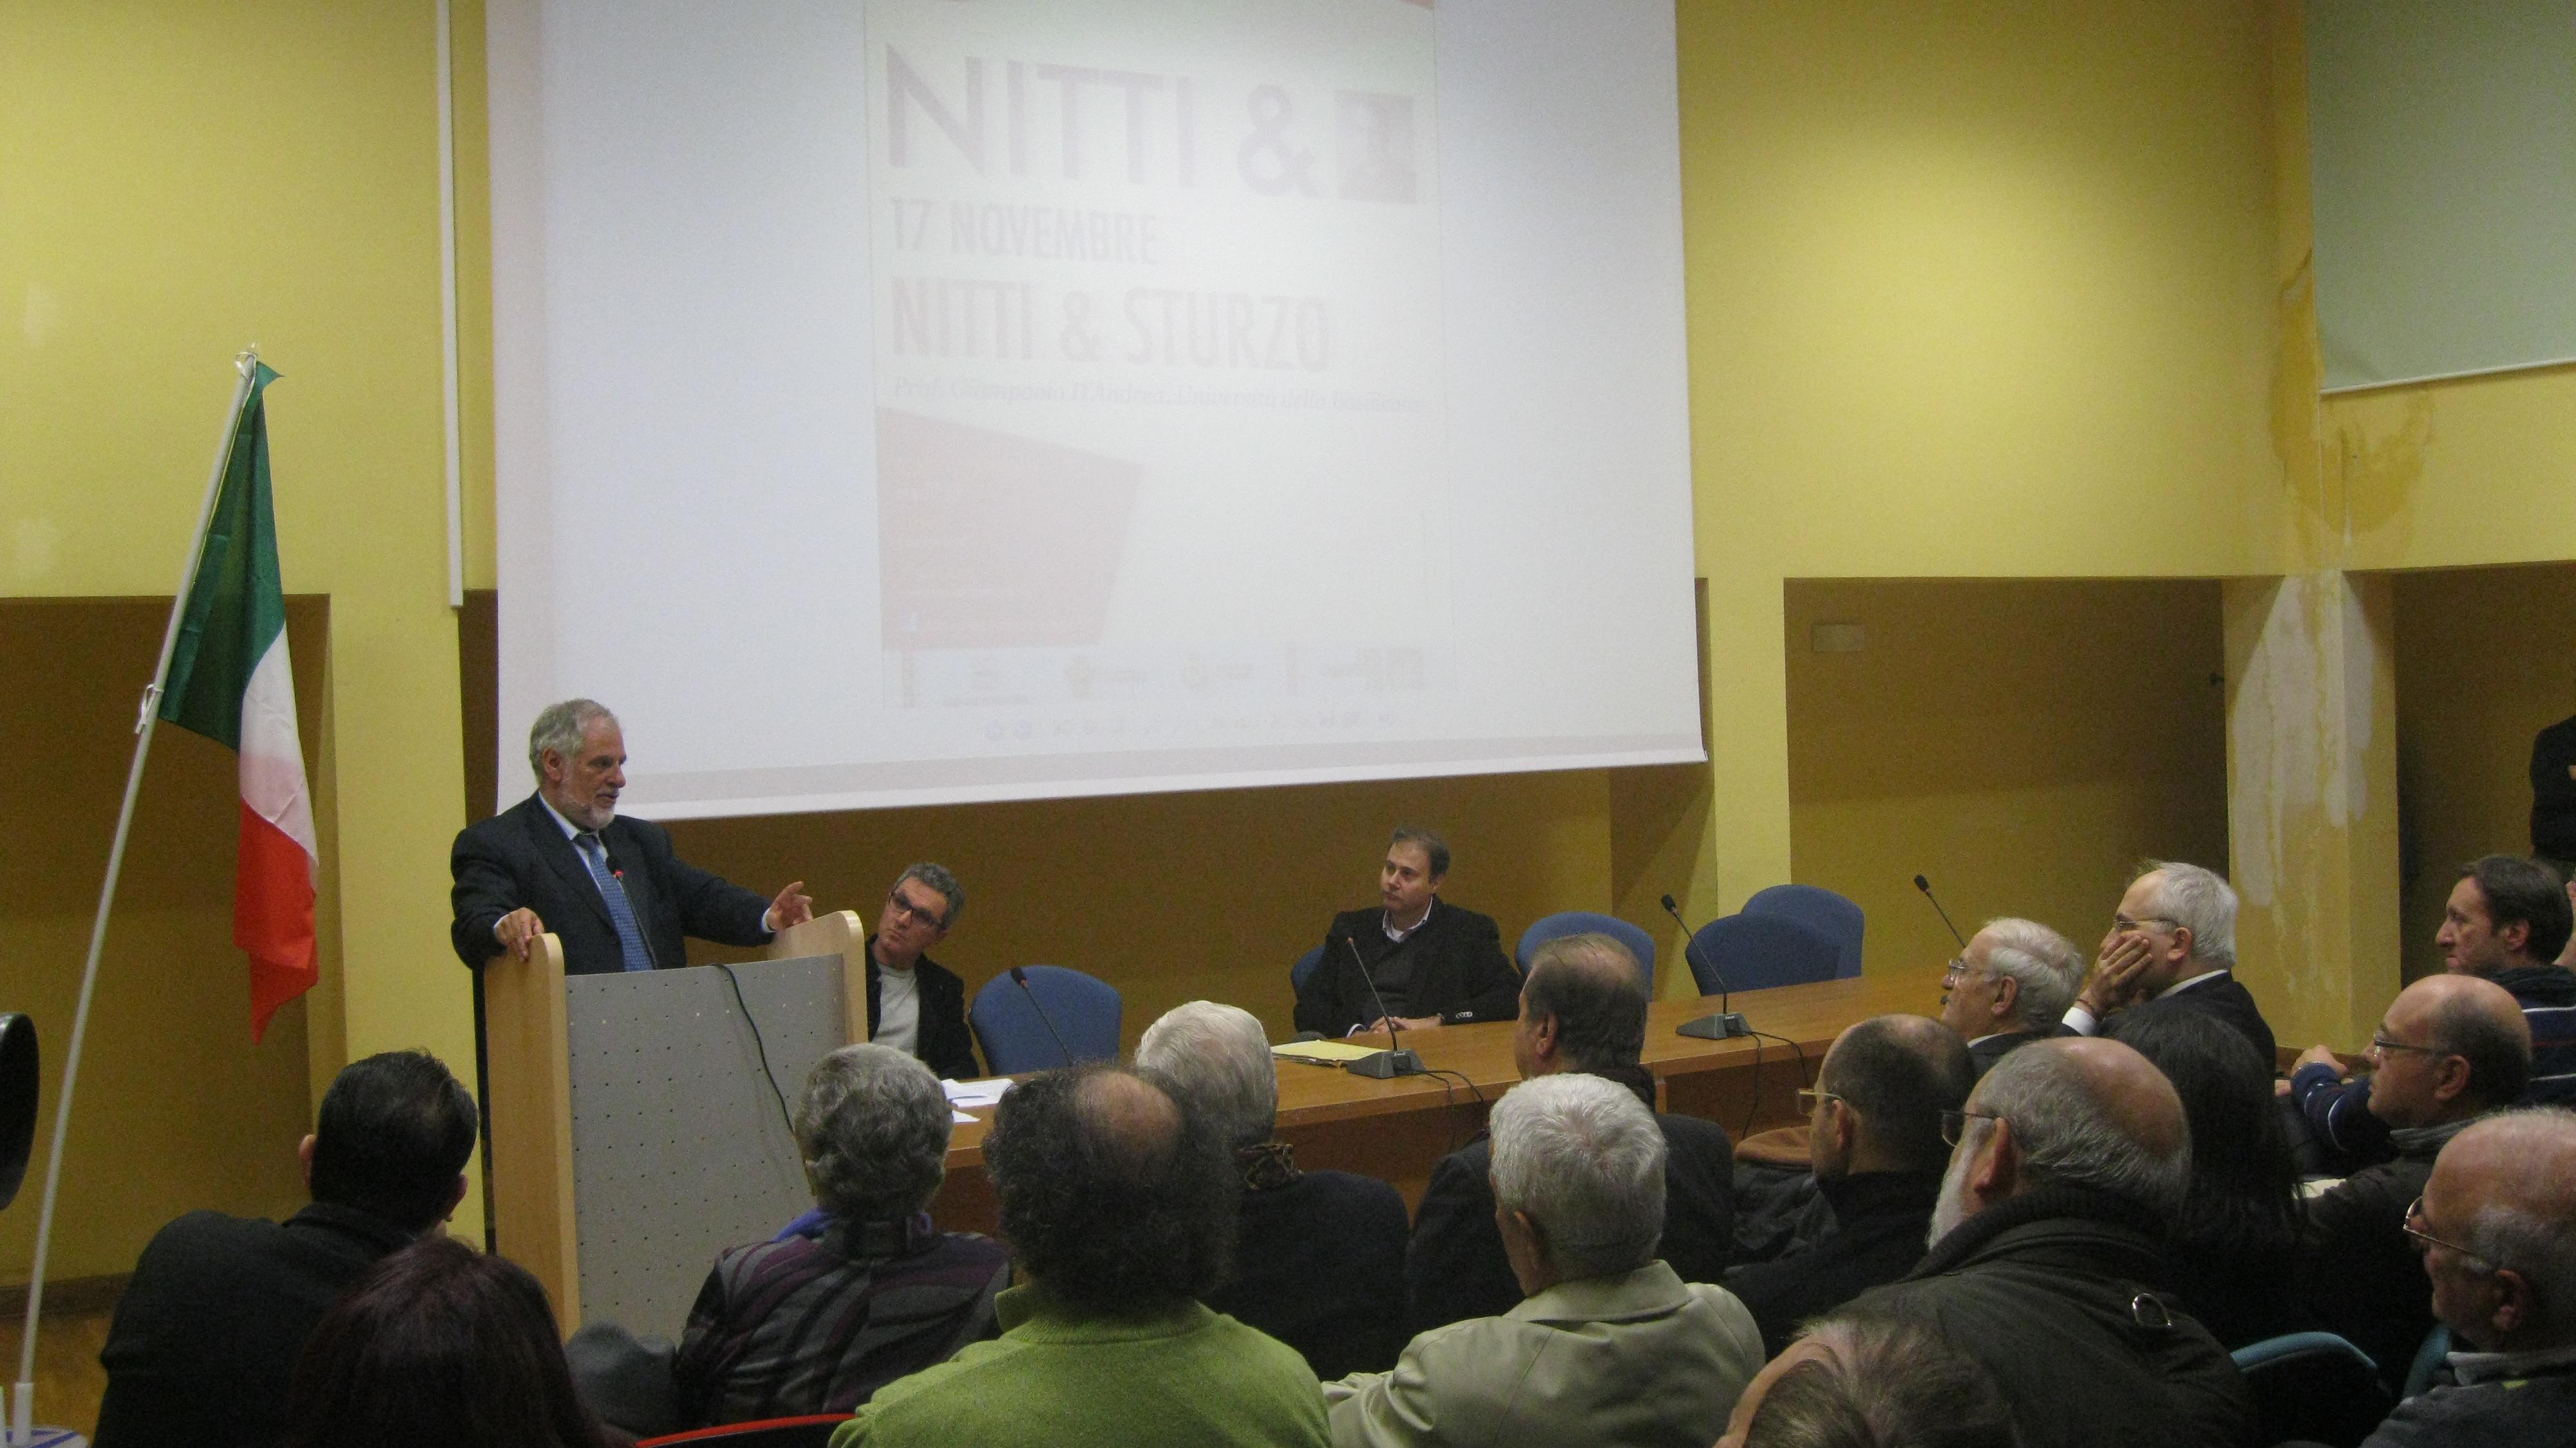 conferenza Nitti & Sturzo 001